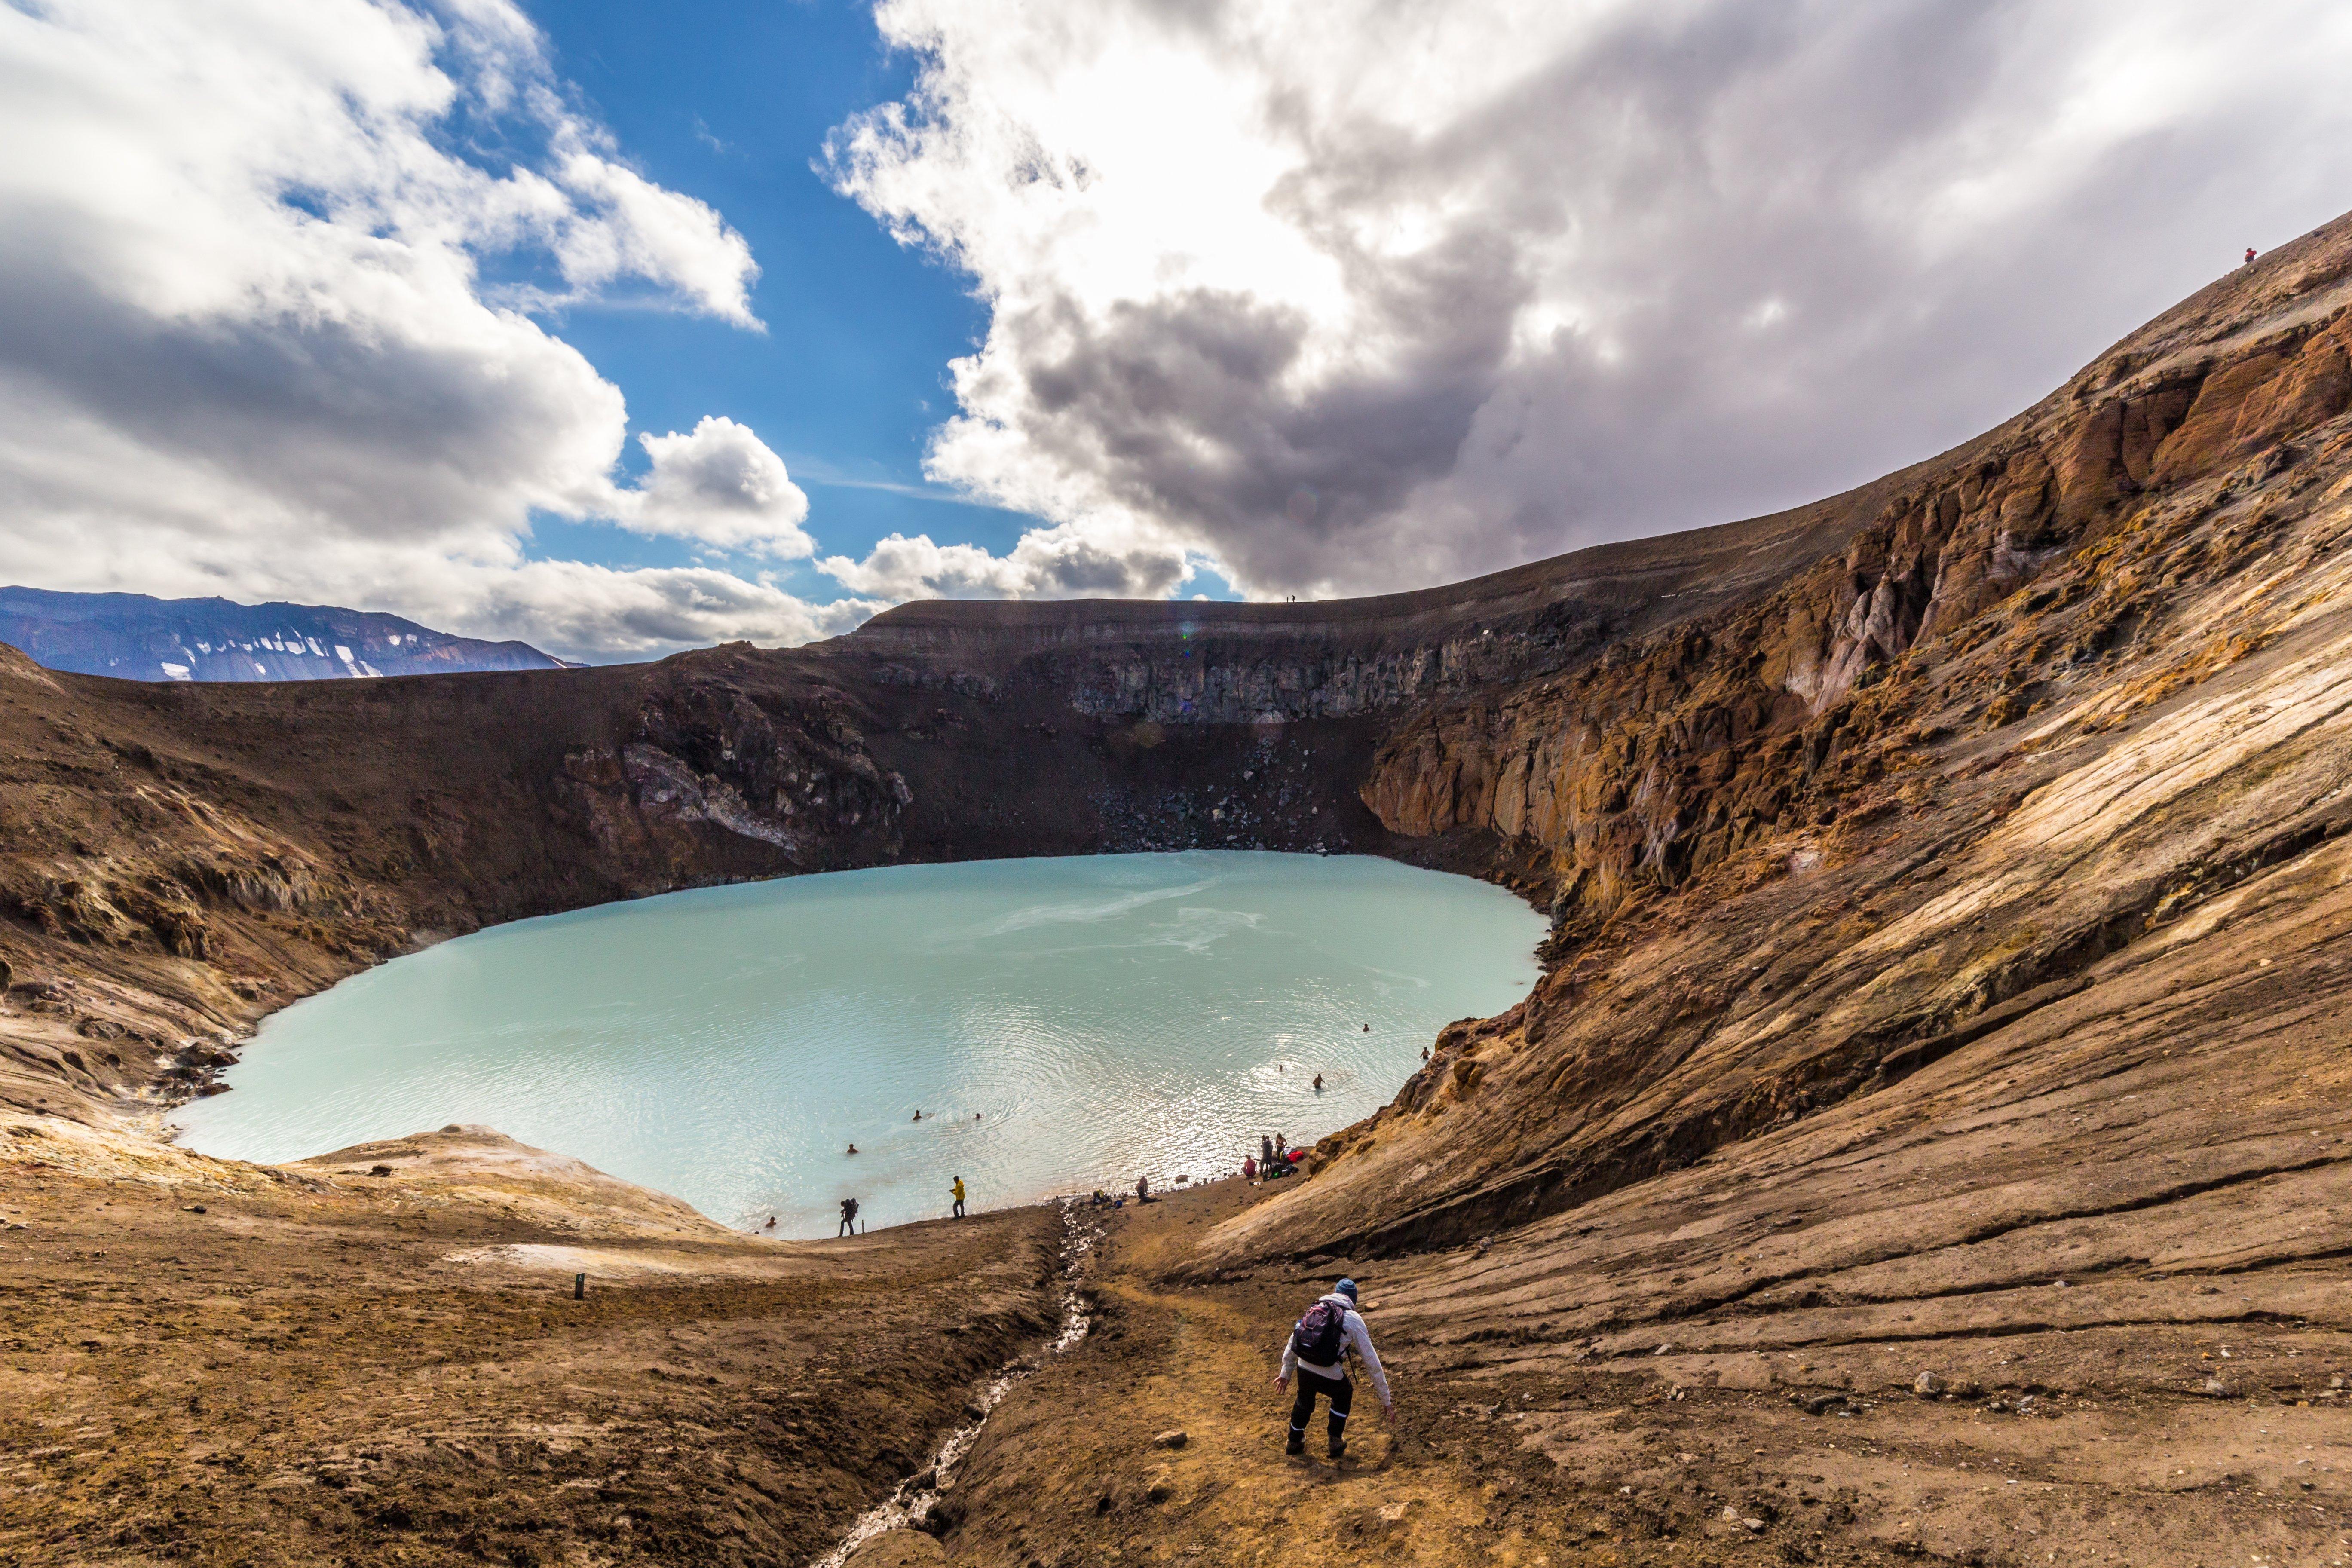 Askja Caldera & Holuhraun lava field- GEO TRAVEL, North Iceland -25